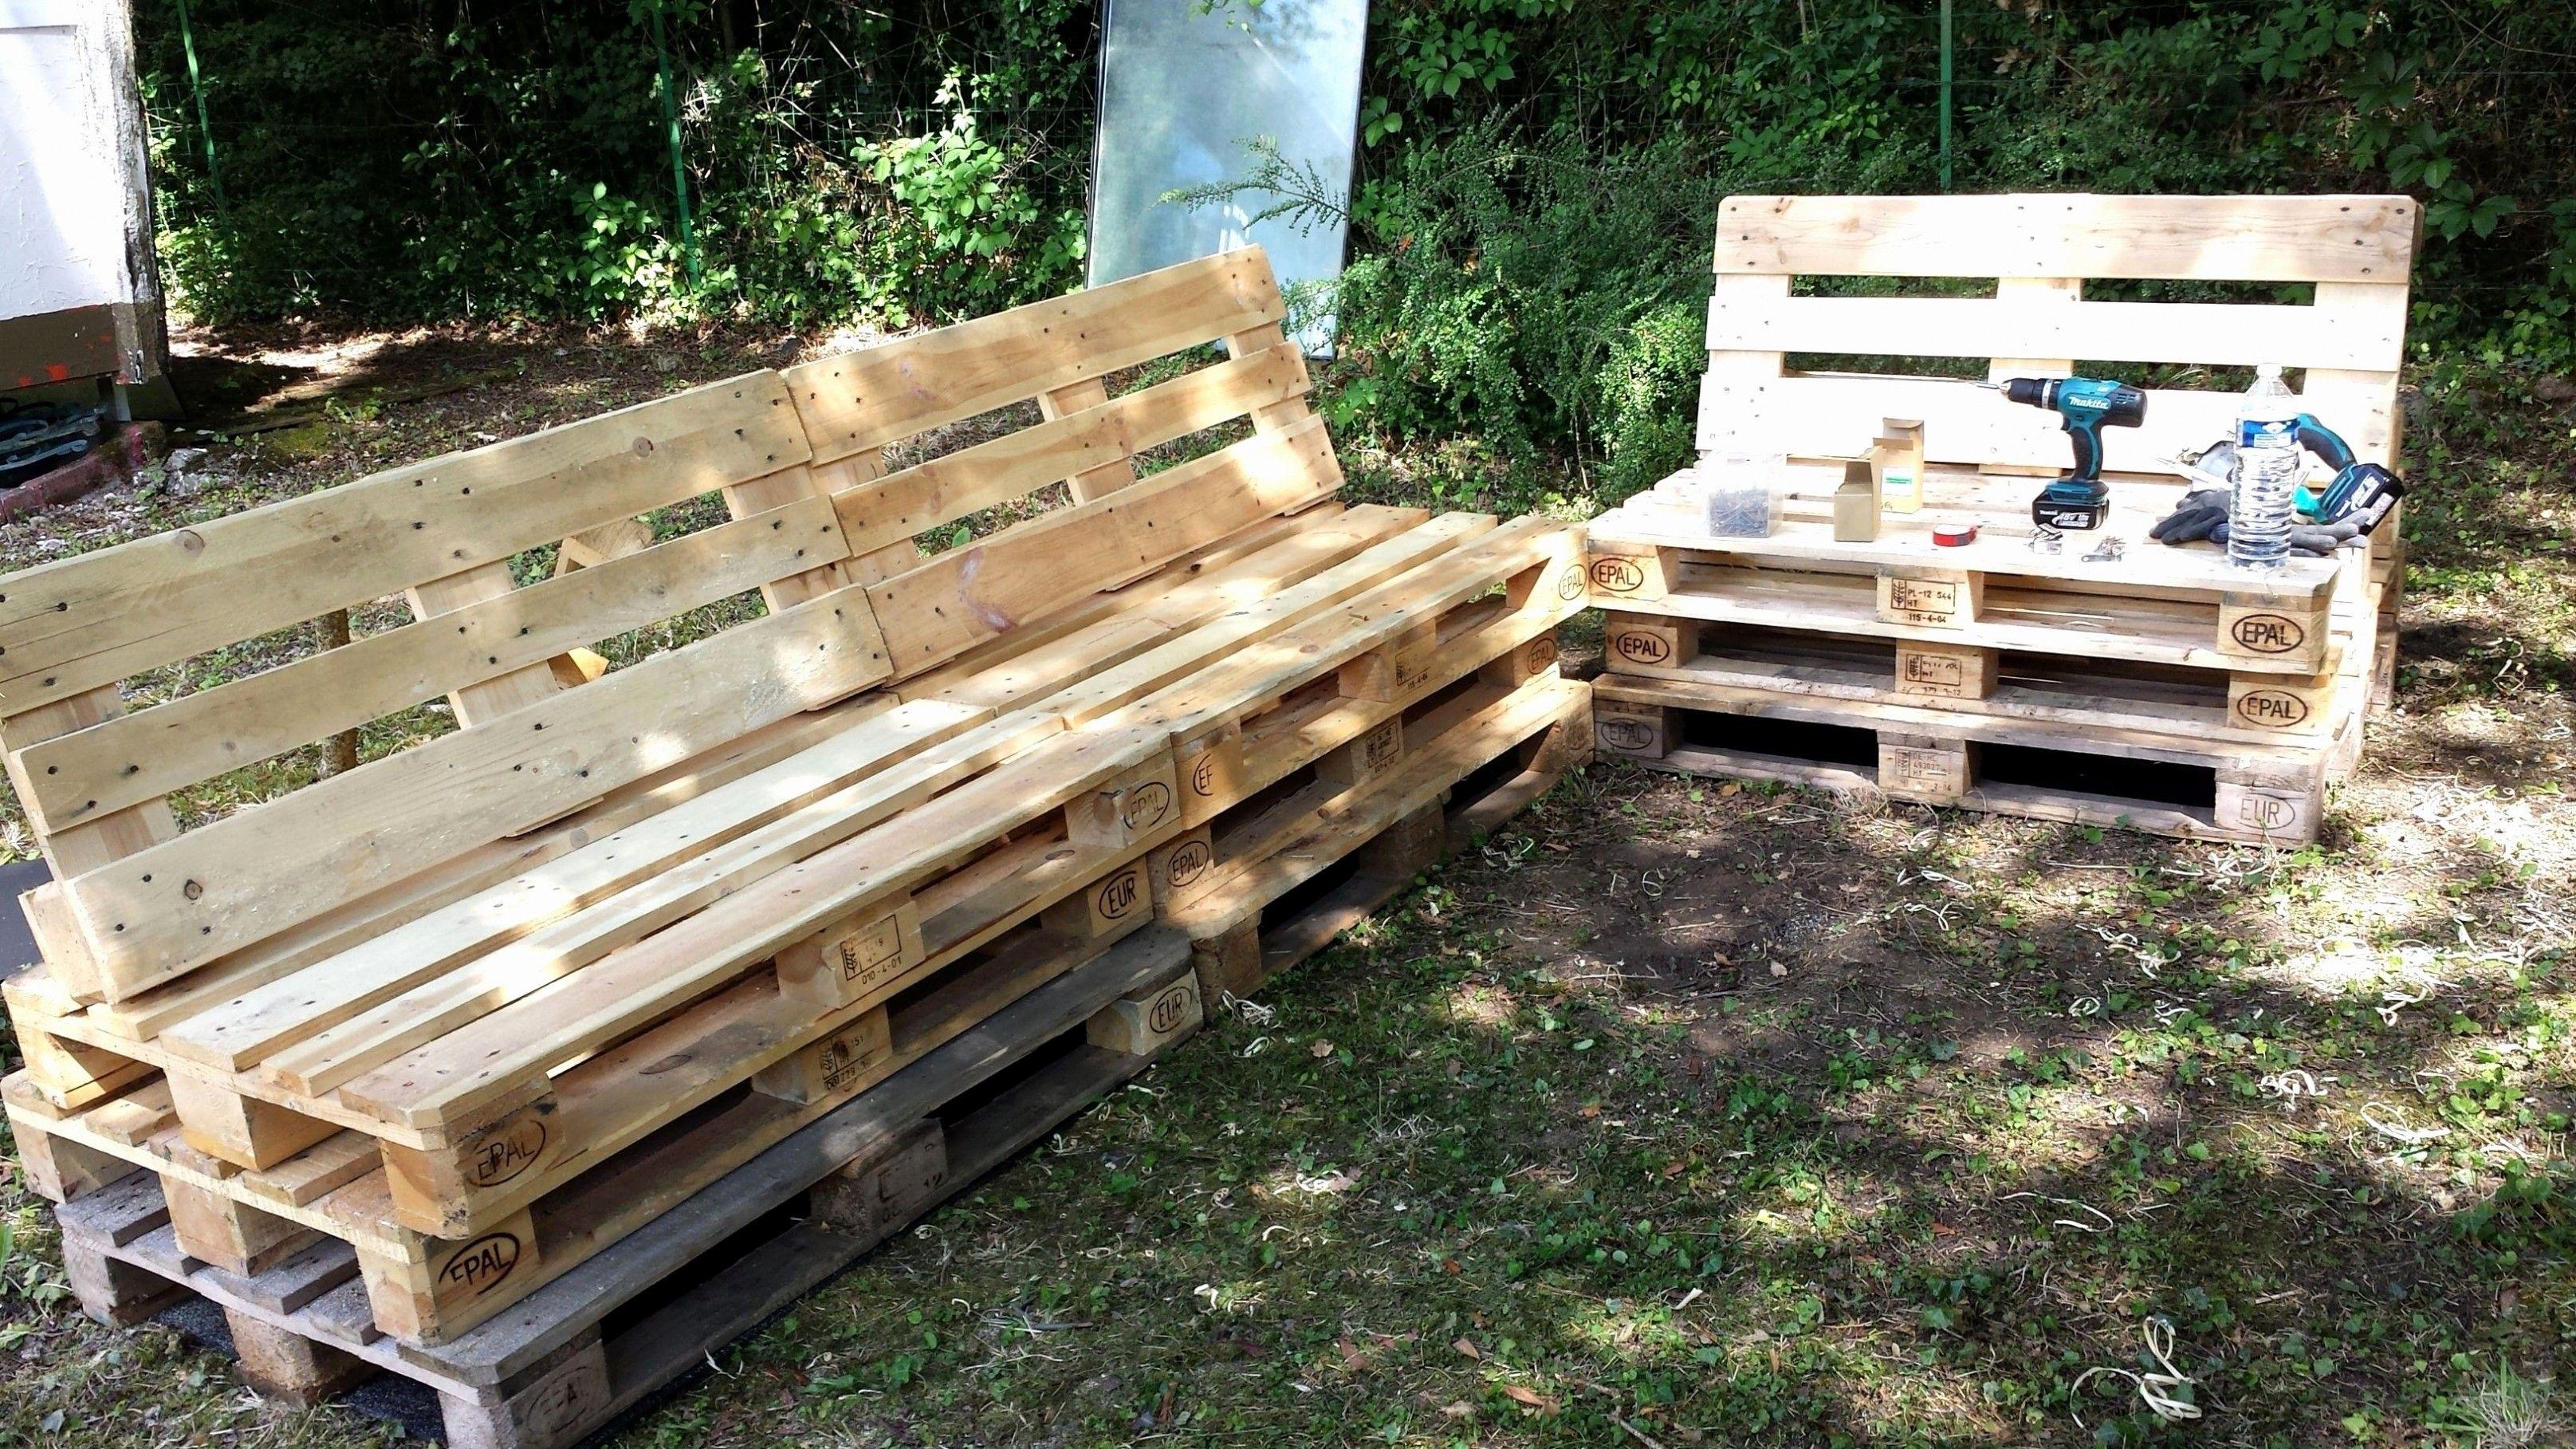 Fabriquer Un Banc En Bois Fabriquer Un Banc En Bois Fabriquer Un Banc Ment Fabriquer Un Banc En Bois Banc Serva Bench Table Wooden Tables Teak Garden Bench